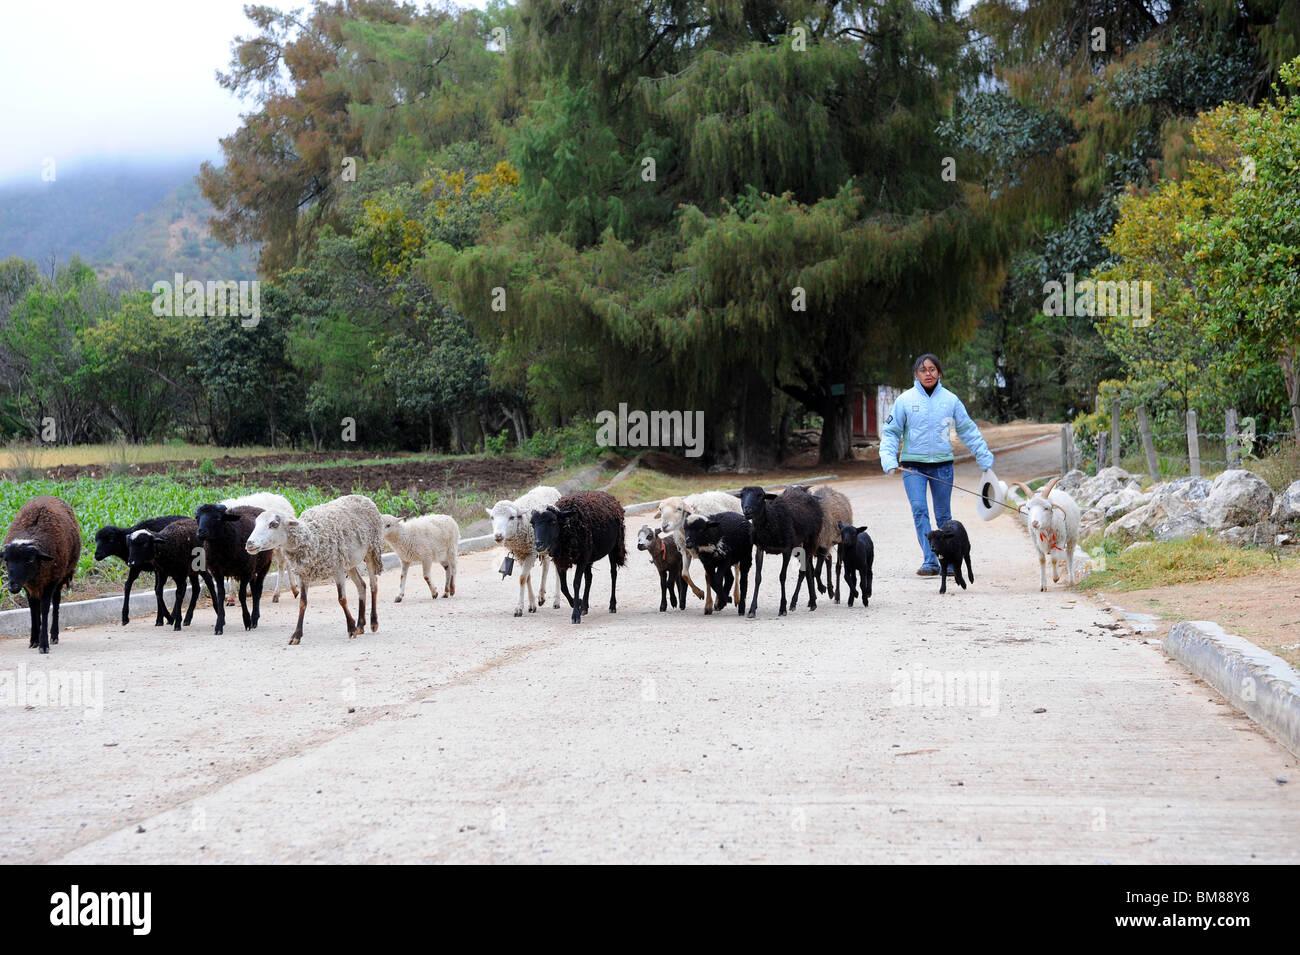 Sheep walking along country road in Santiago Apoala, Mexico - Stock Image